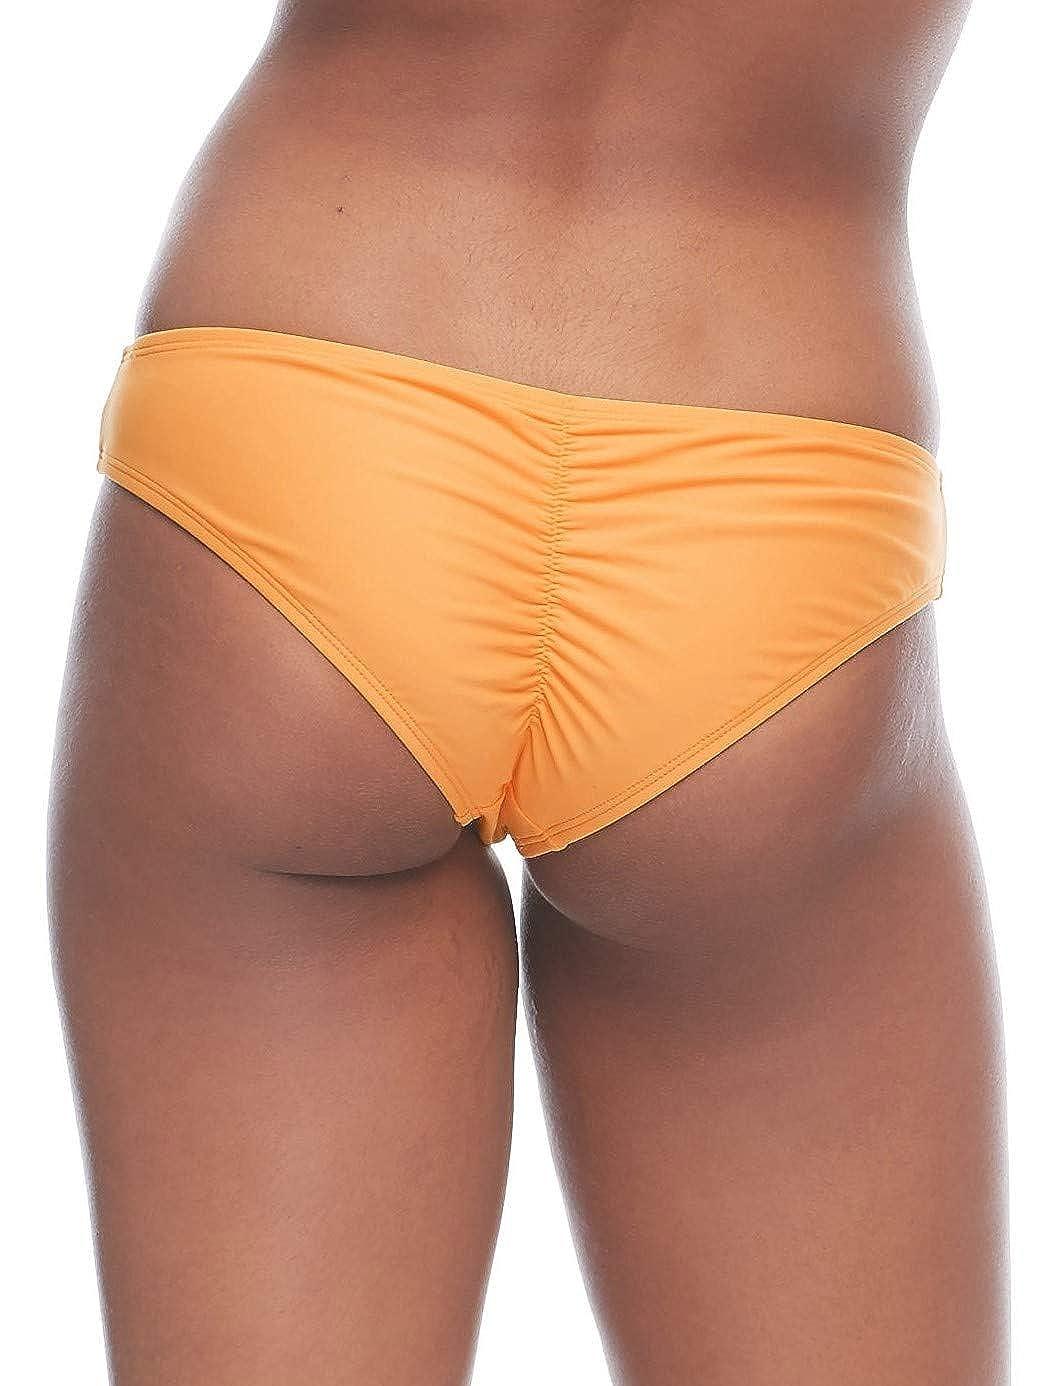 Body Glove Womens Smoothies Eclipse Solid Surf Rider Bikini Bottom Swimsuit